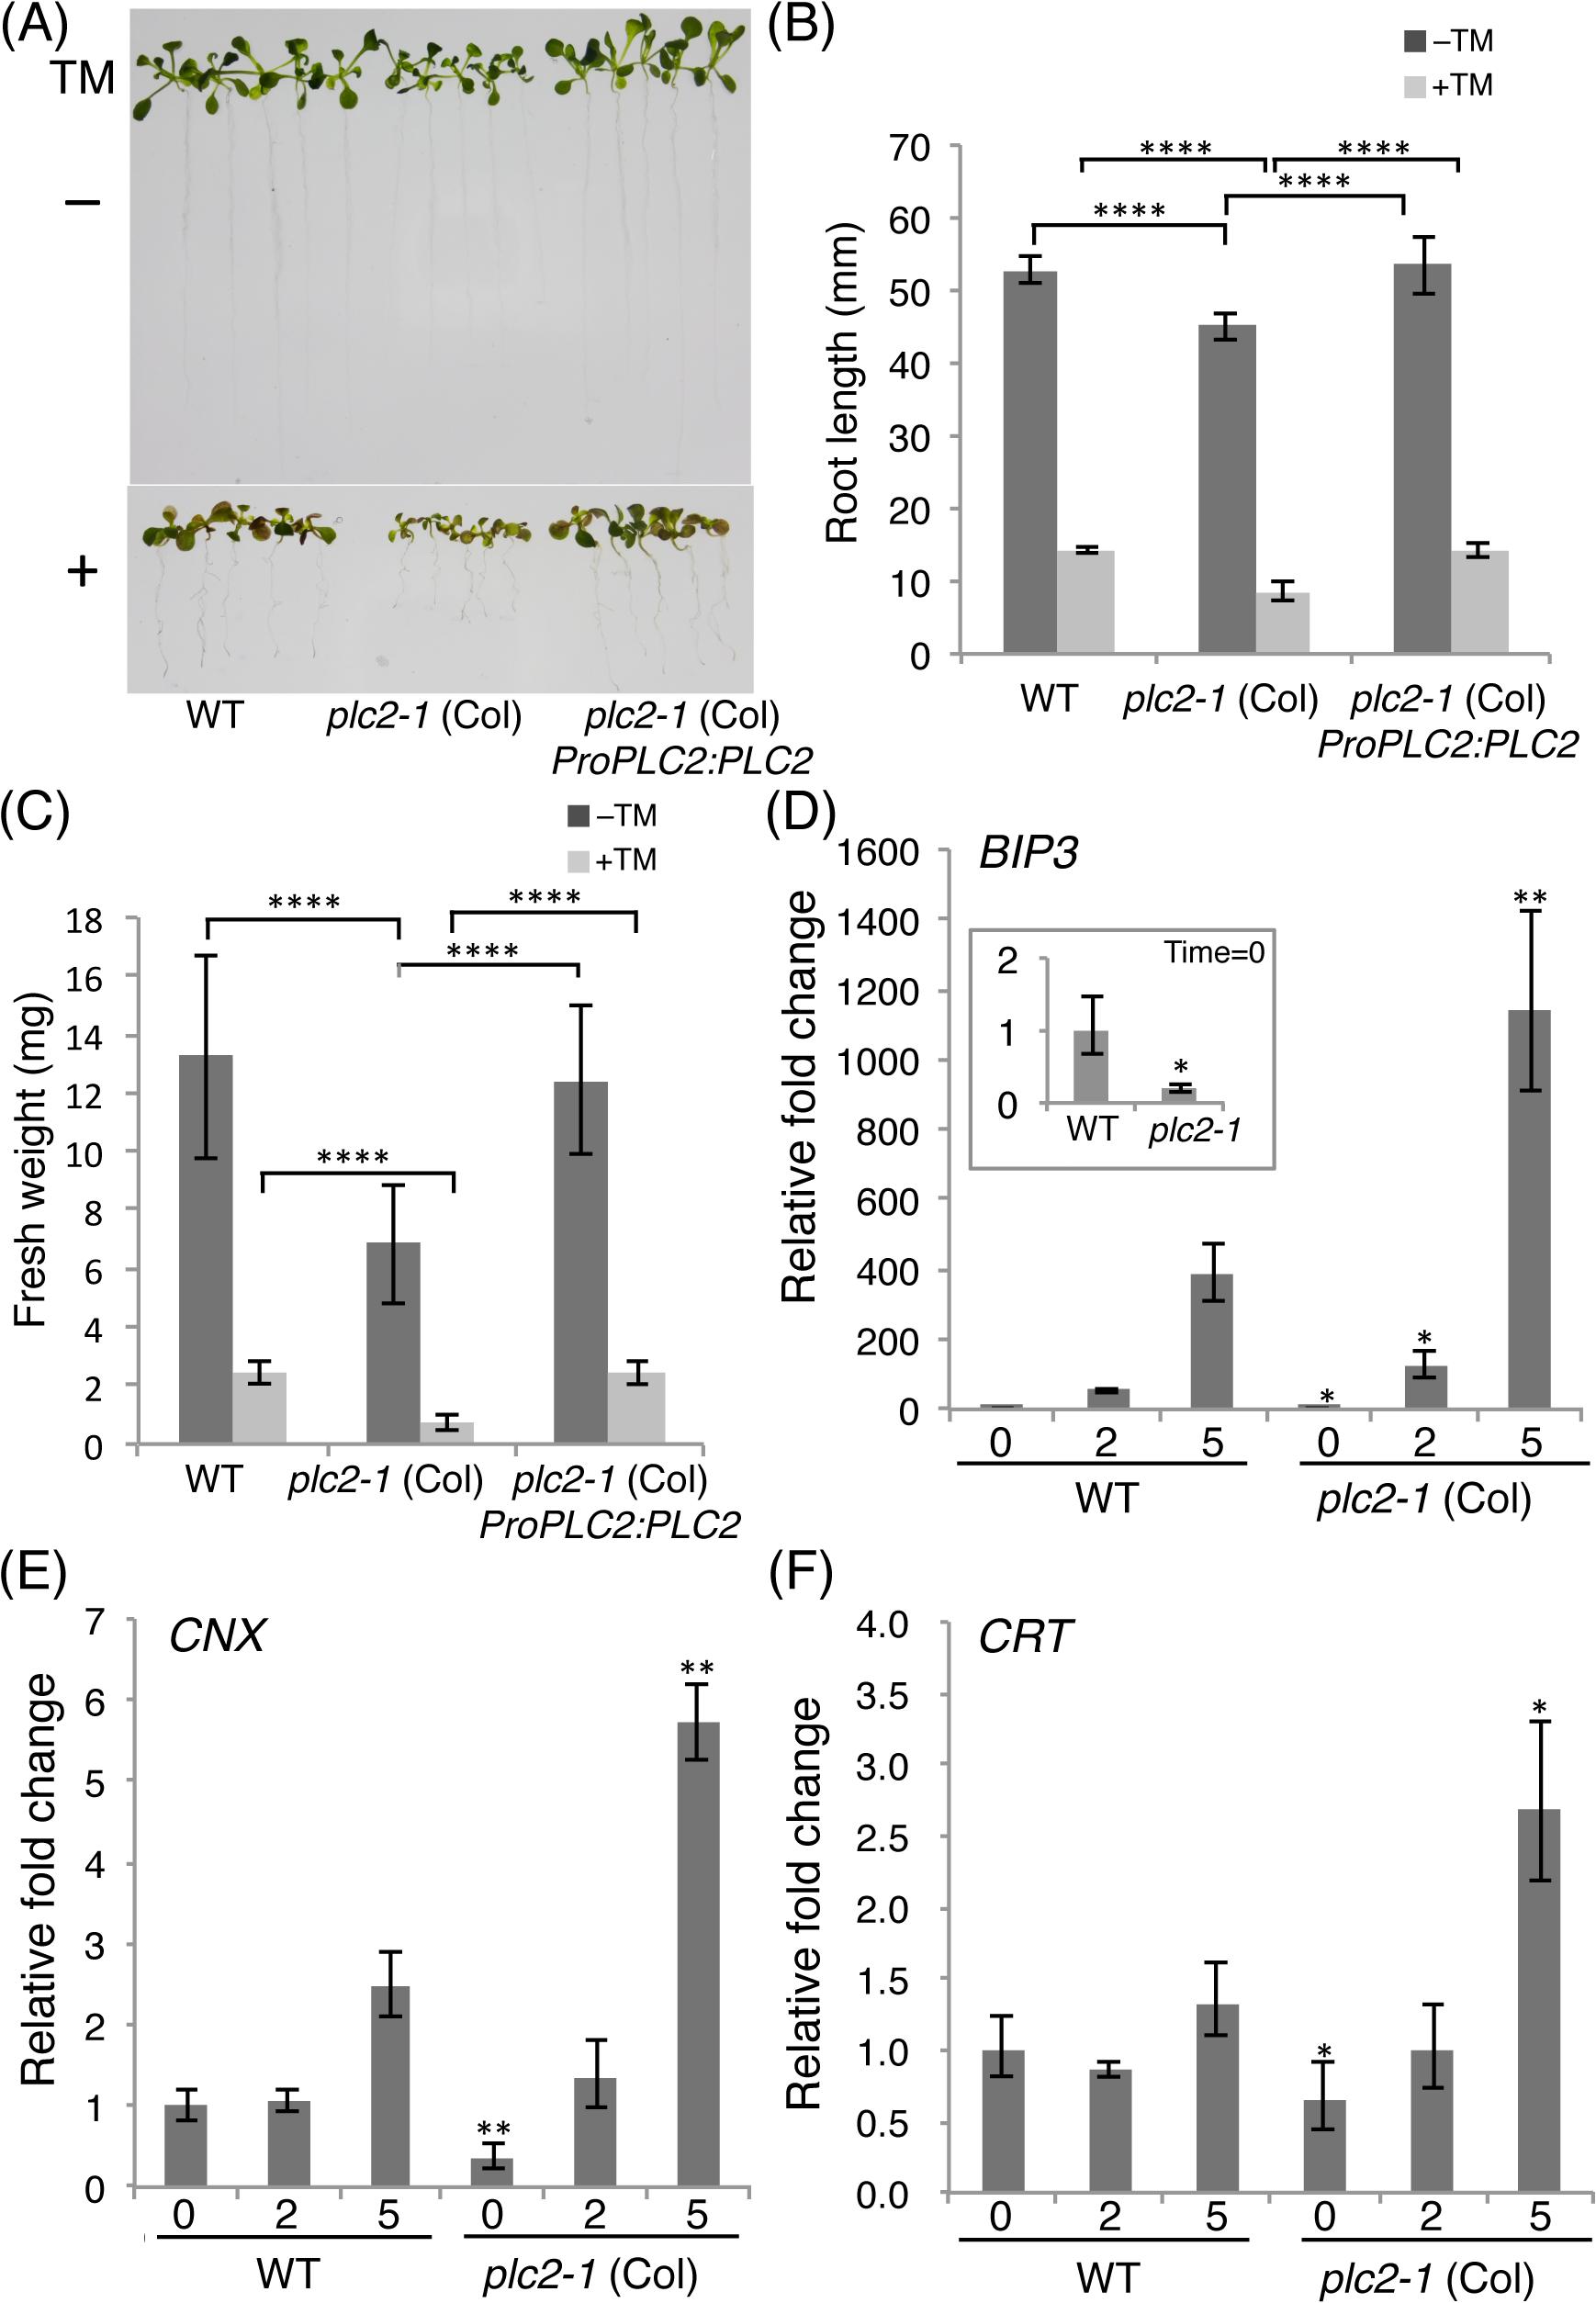 Enhanced susceptibility of the <i>plc2-1</i> mutant to the ER stress.